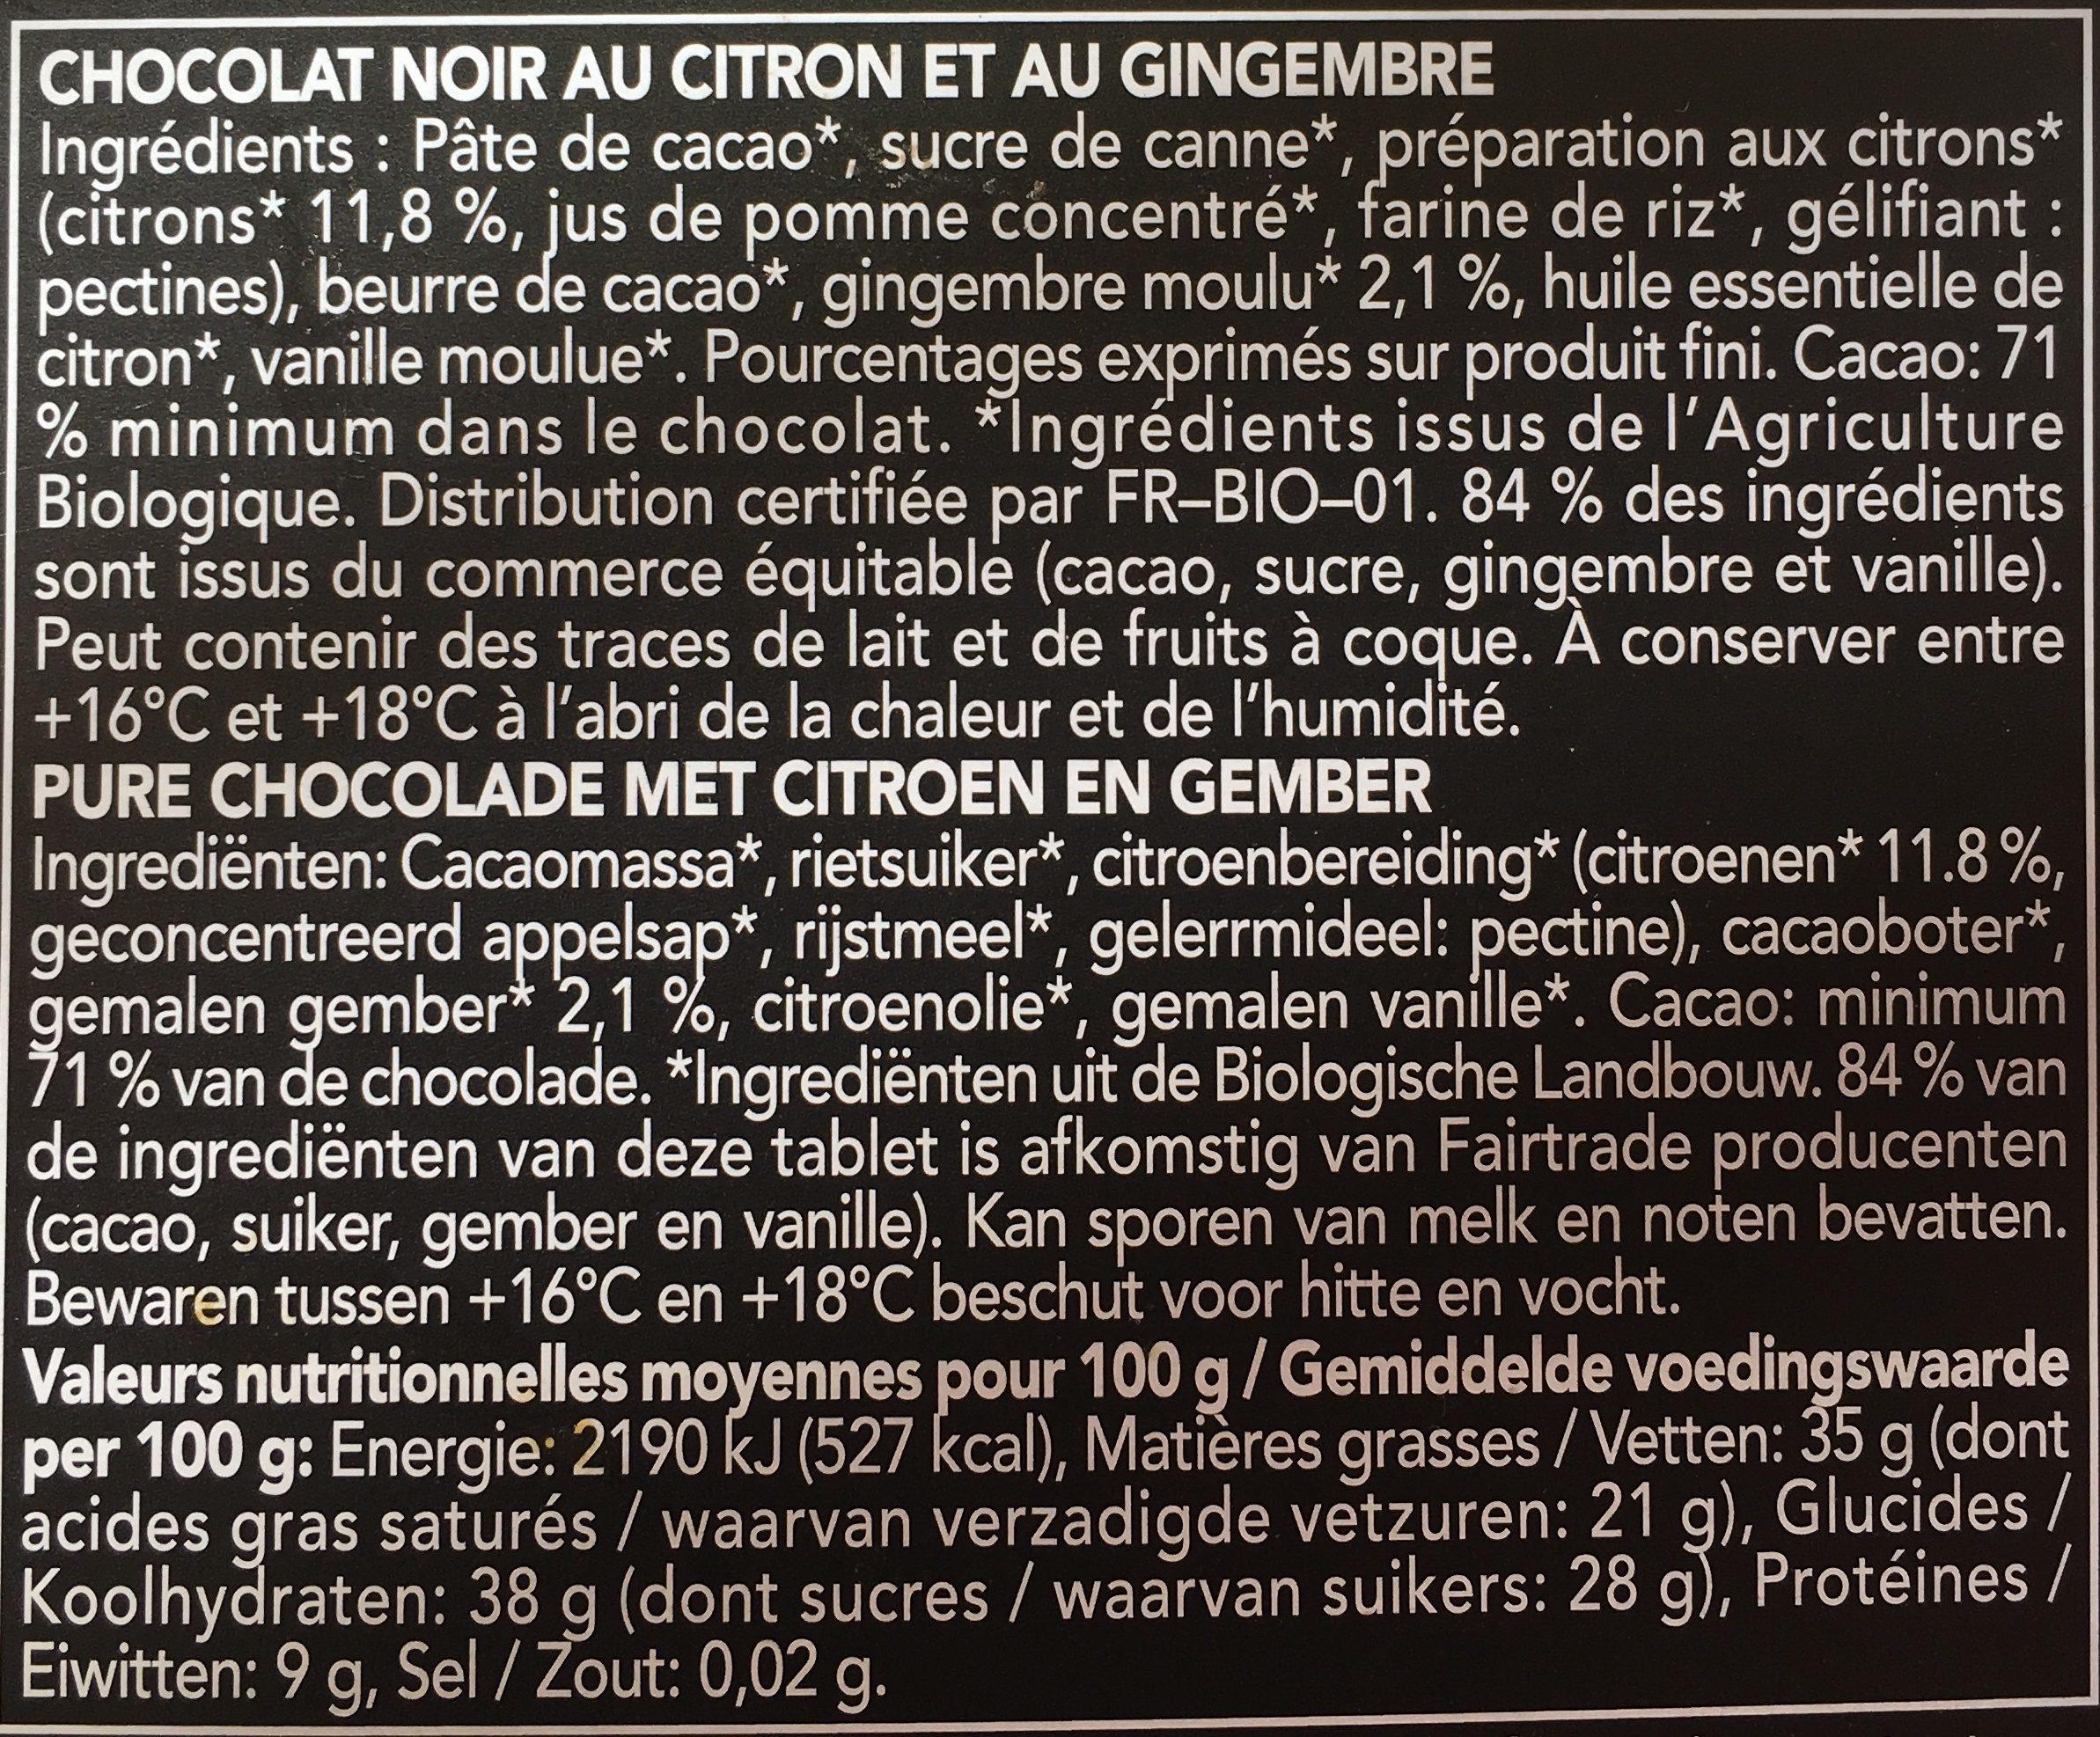 Chocolat noir citron gingembre - Ingredients